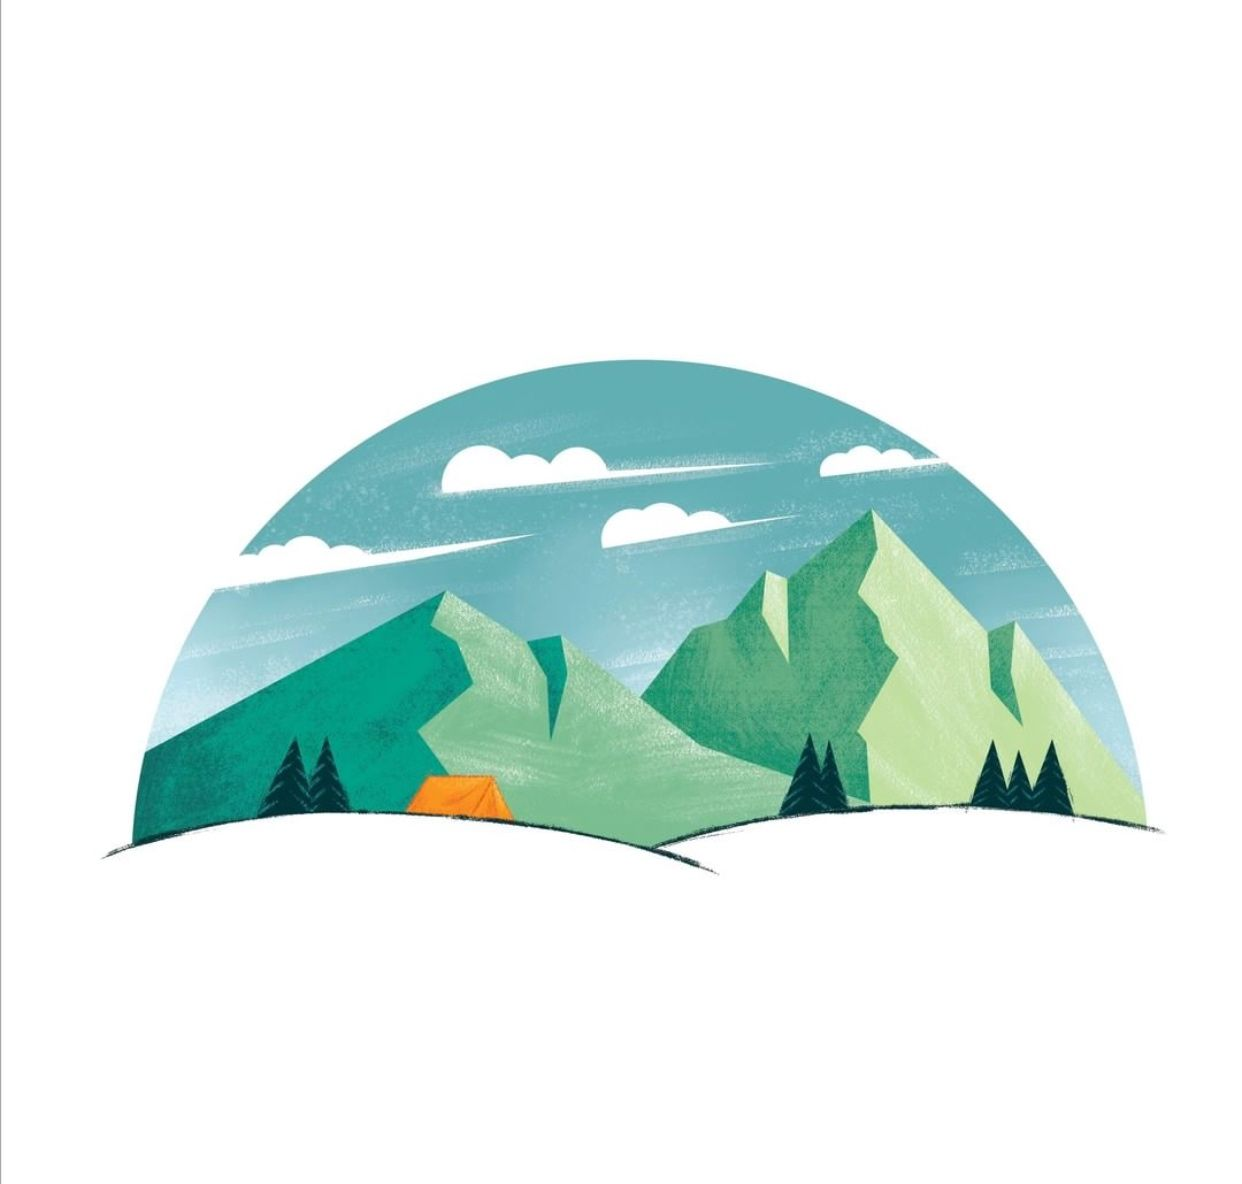 Camping Mountain Illustration Print Tent Mountain Wanderlust